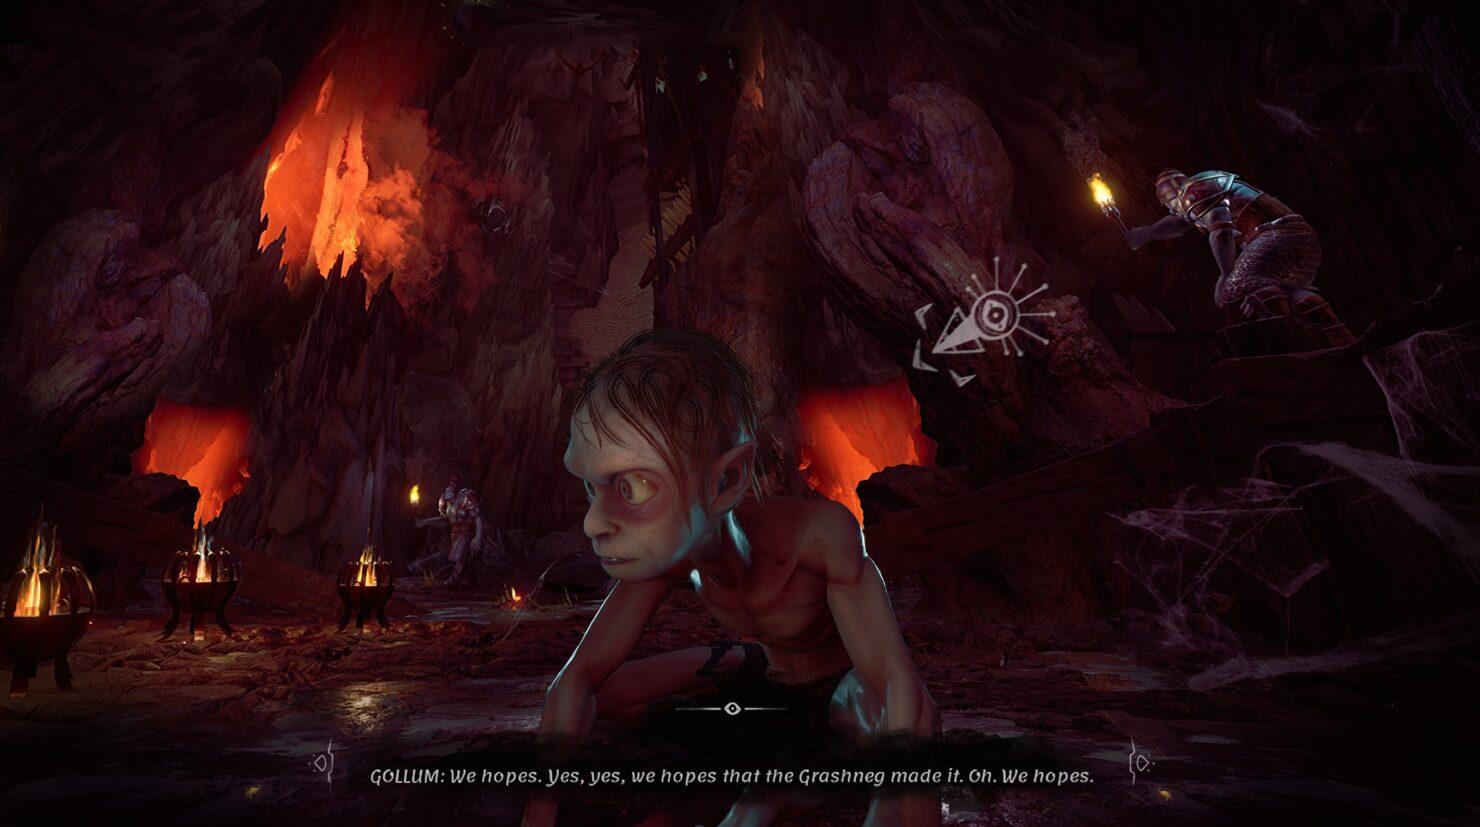 Daedalic показала первые скриншоты The Lord of the Rings: Gollum 6